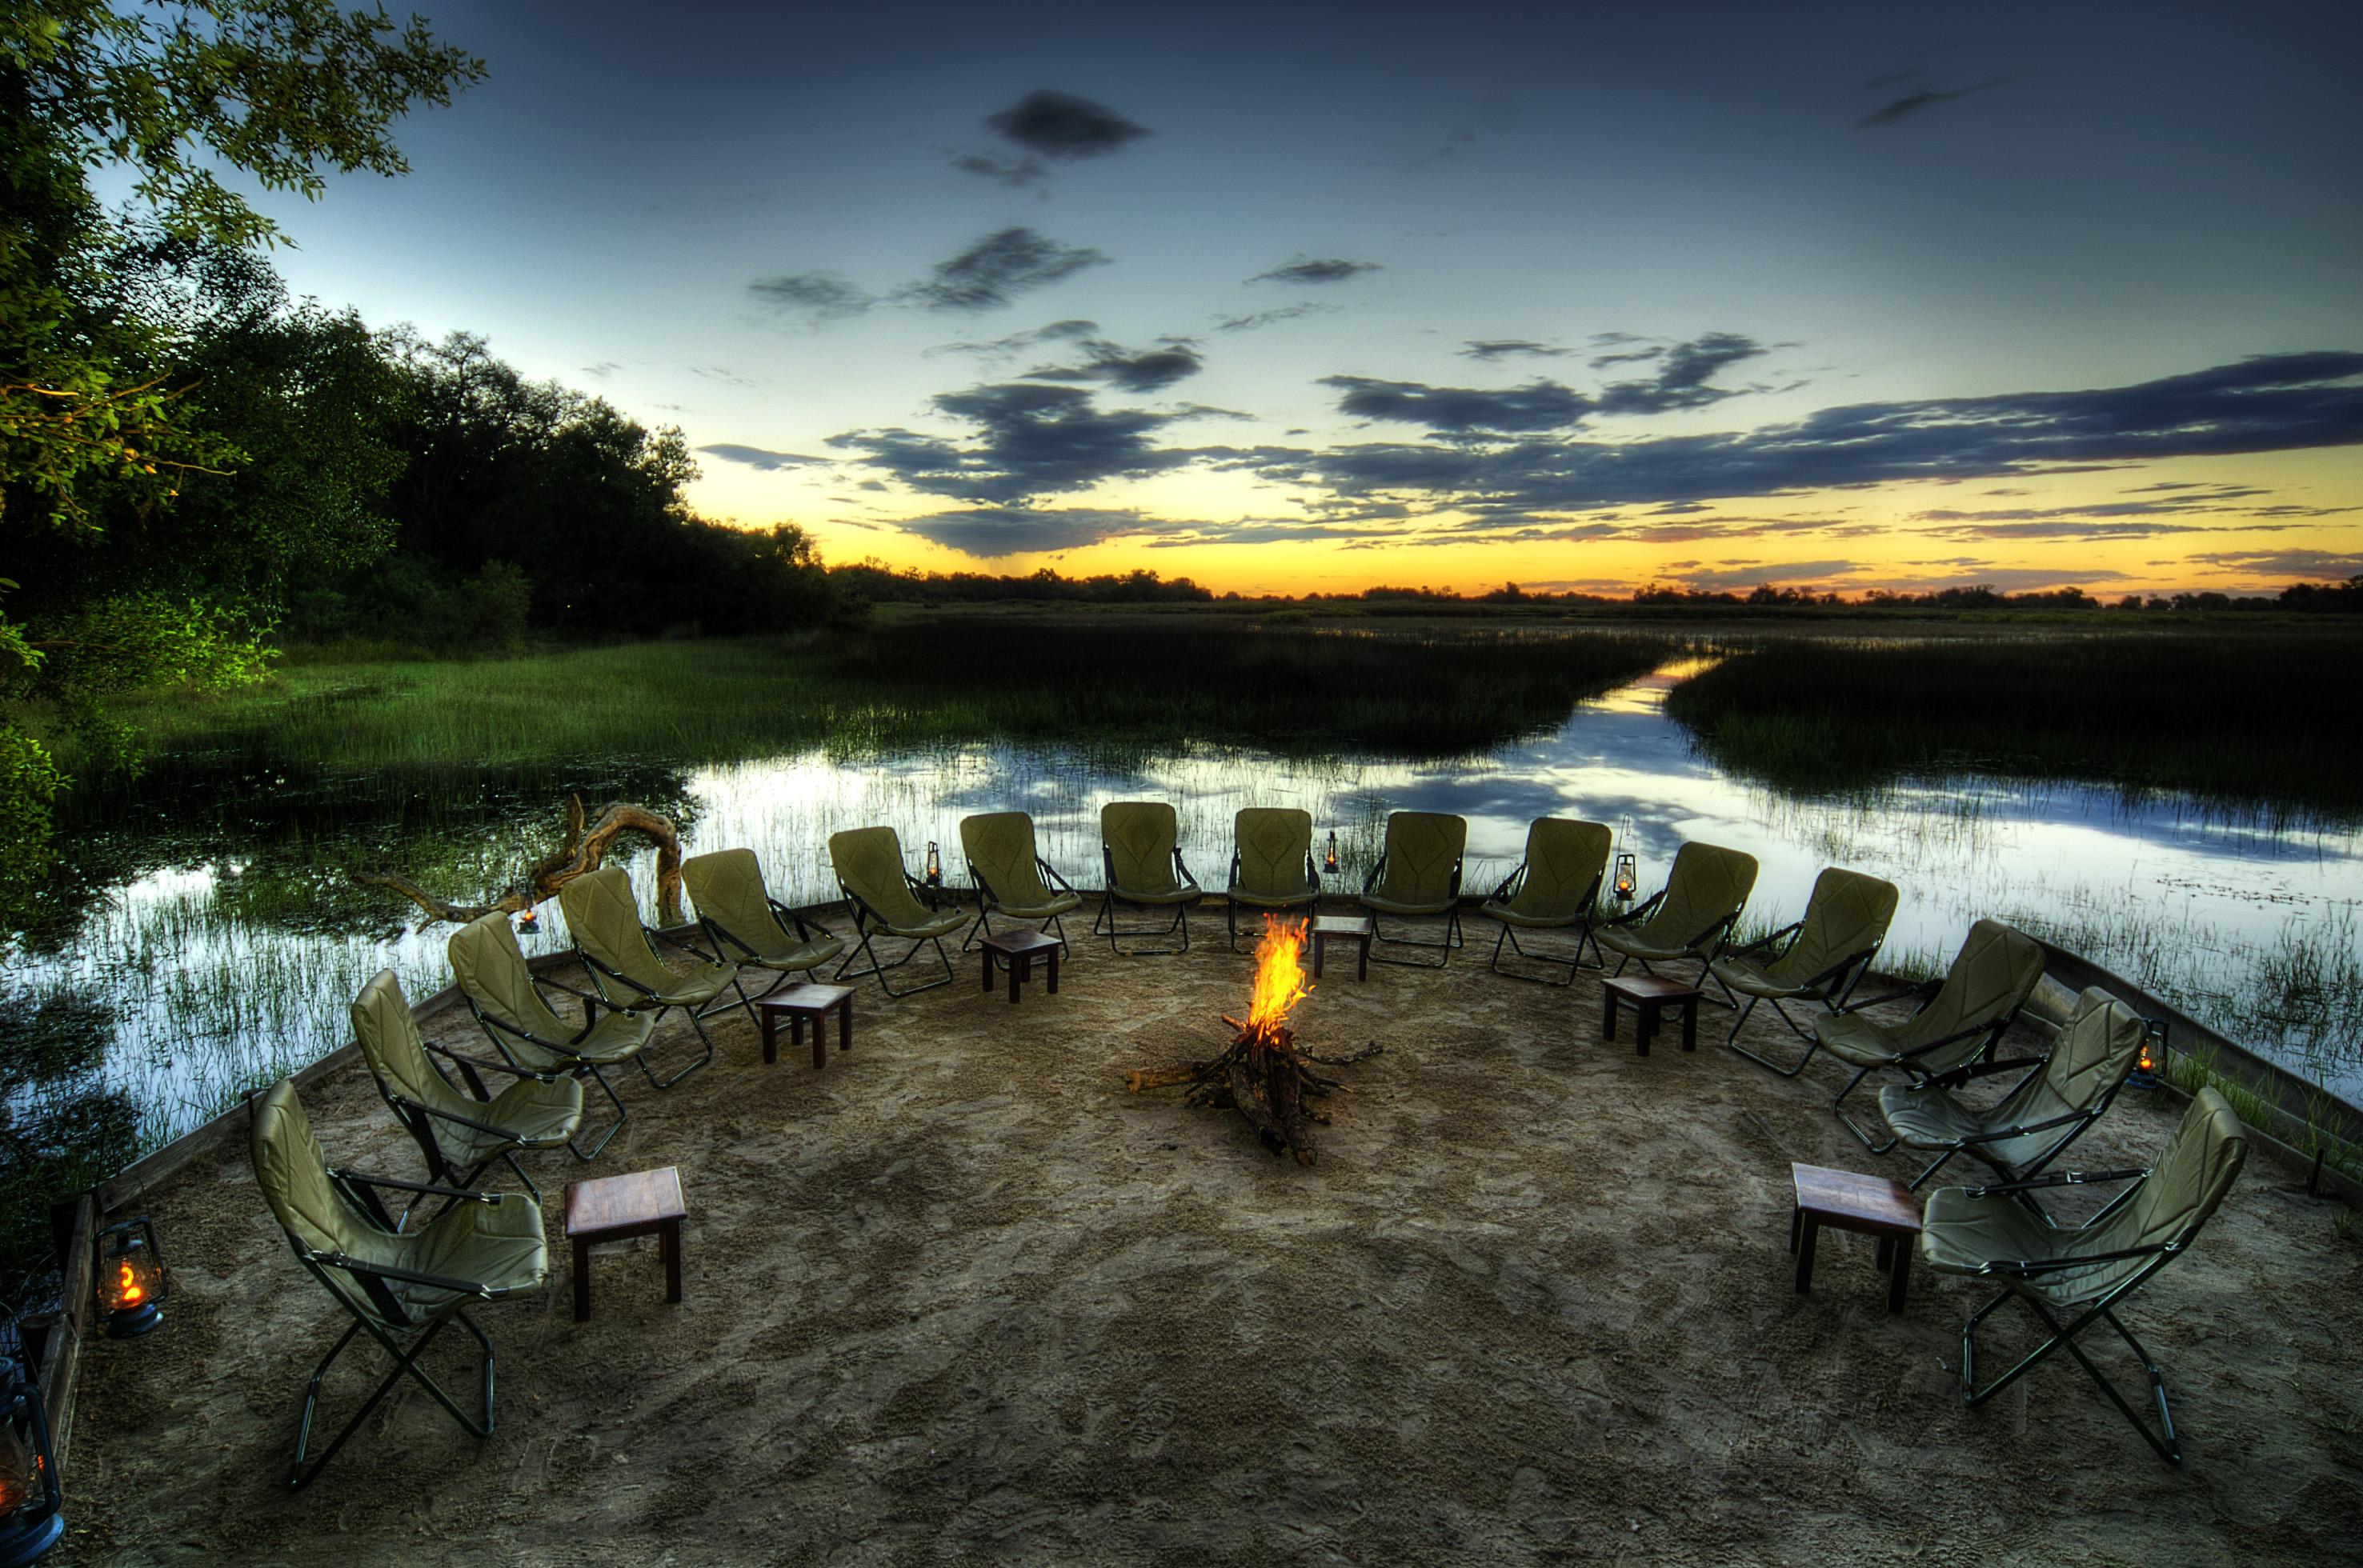 Camp fire at Kanana Camp - Okavango Delta, Bostwana